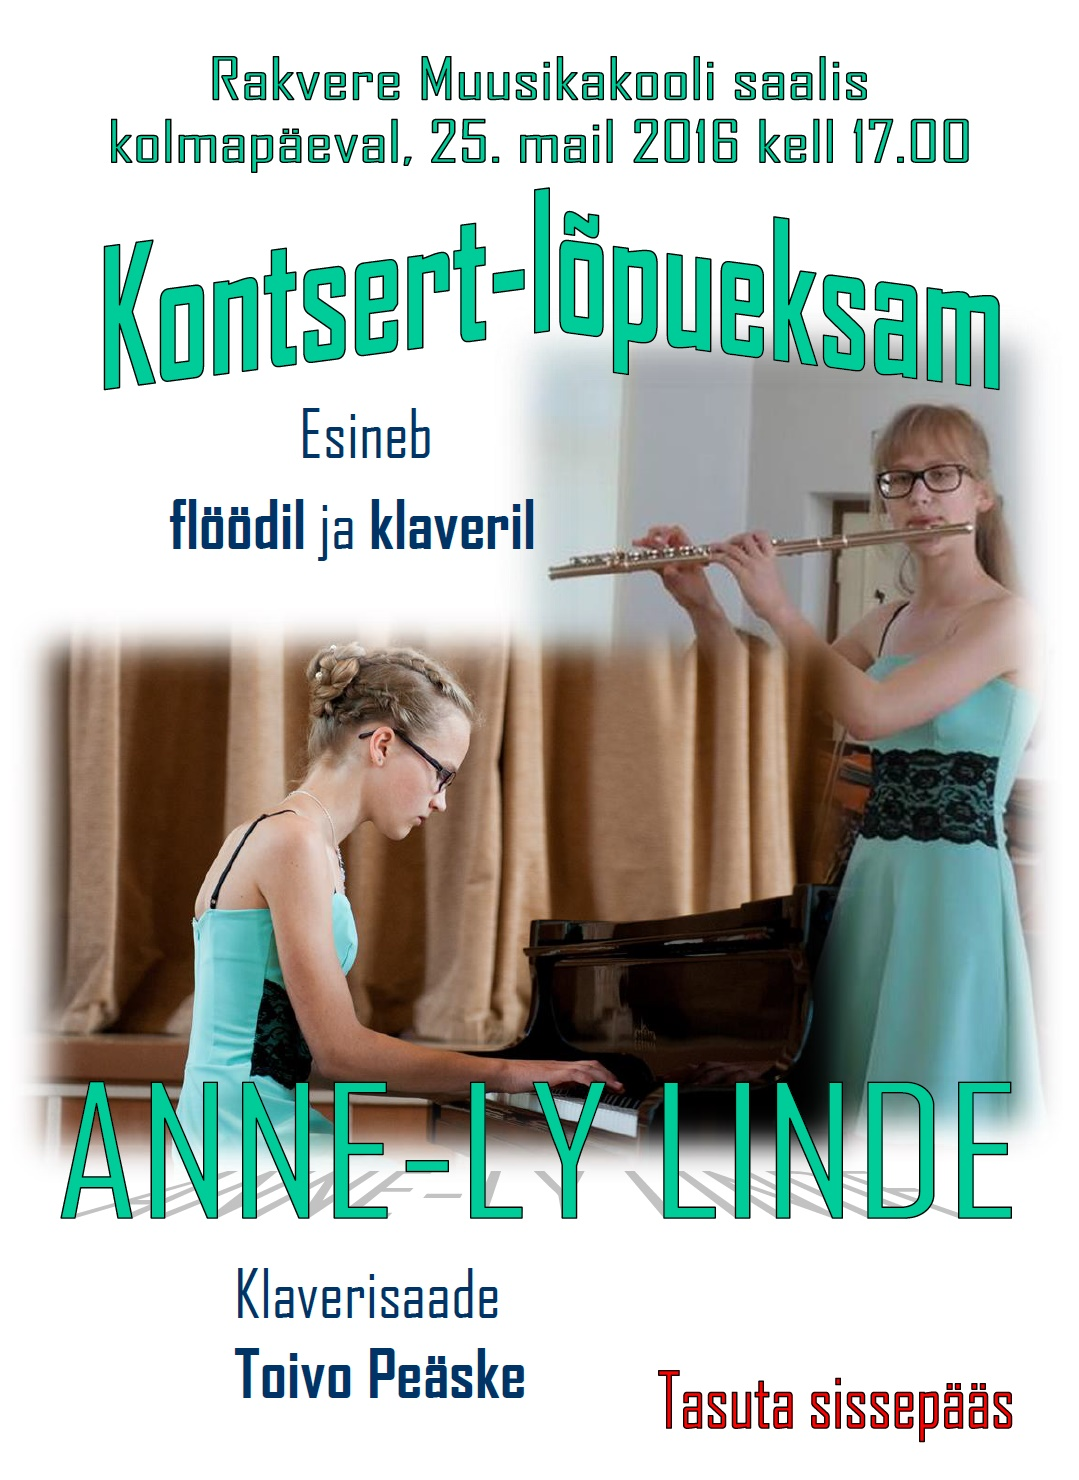 A-L Linde kontsert